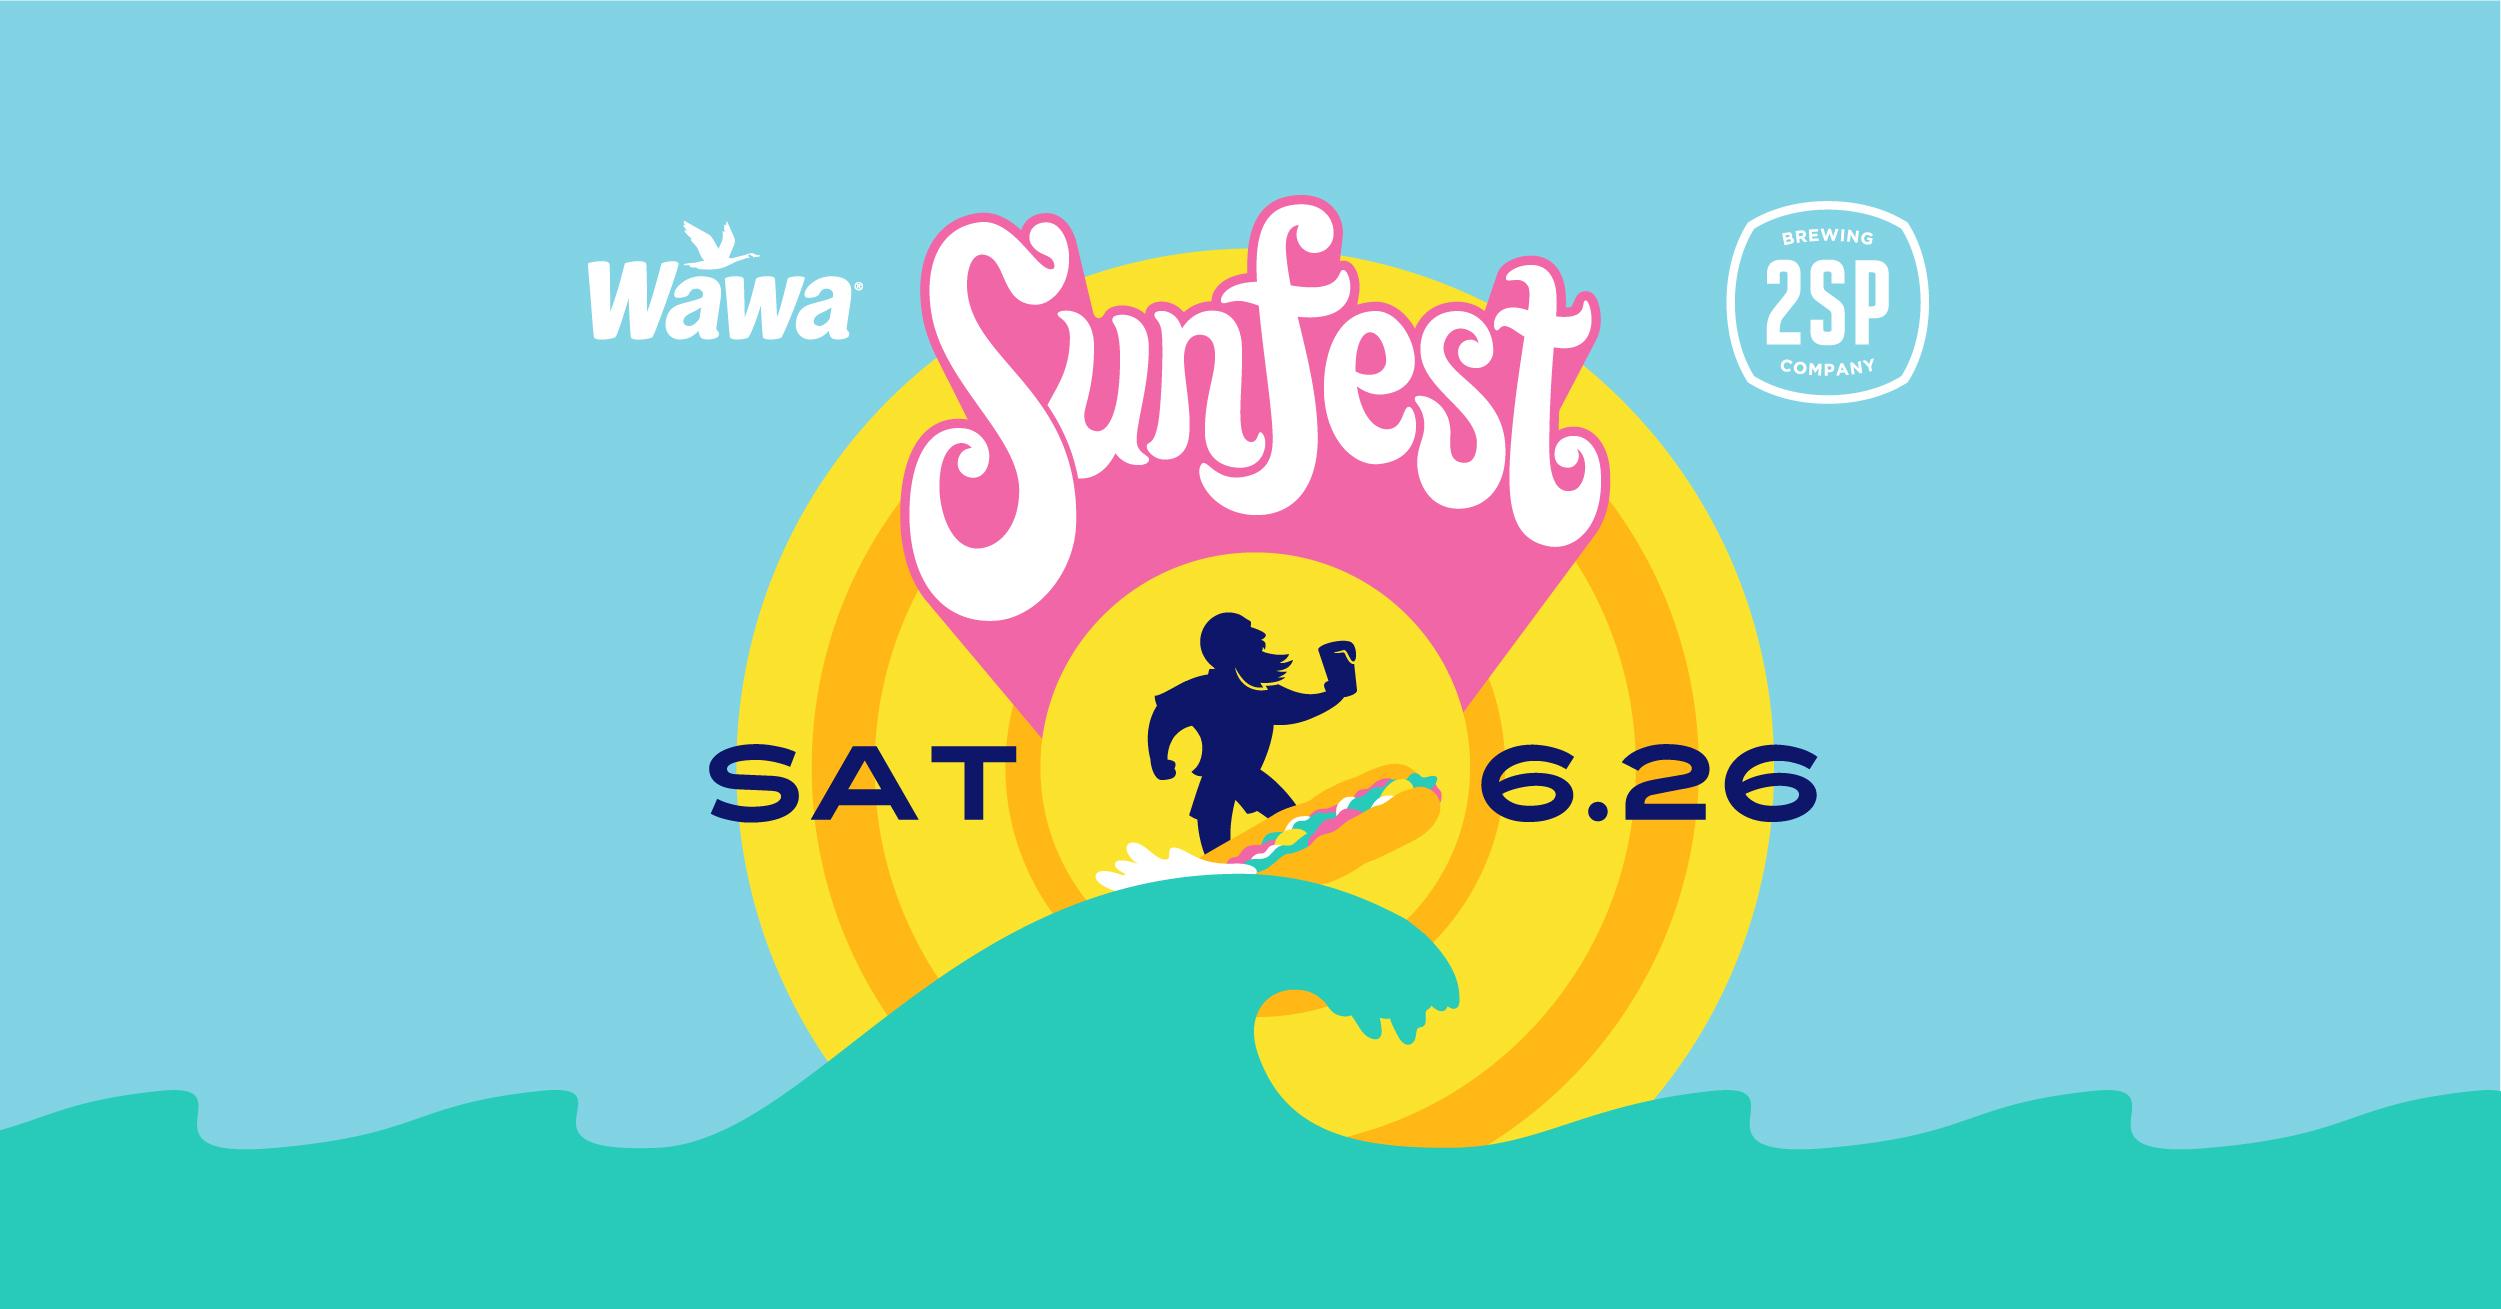 2SP Sunfest Social Media – Sunfest Party – FB Cover